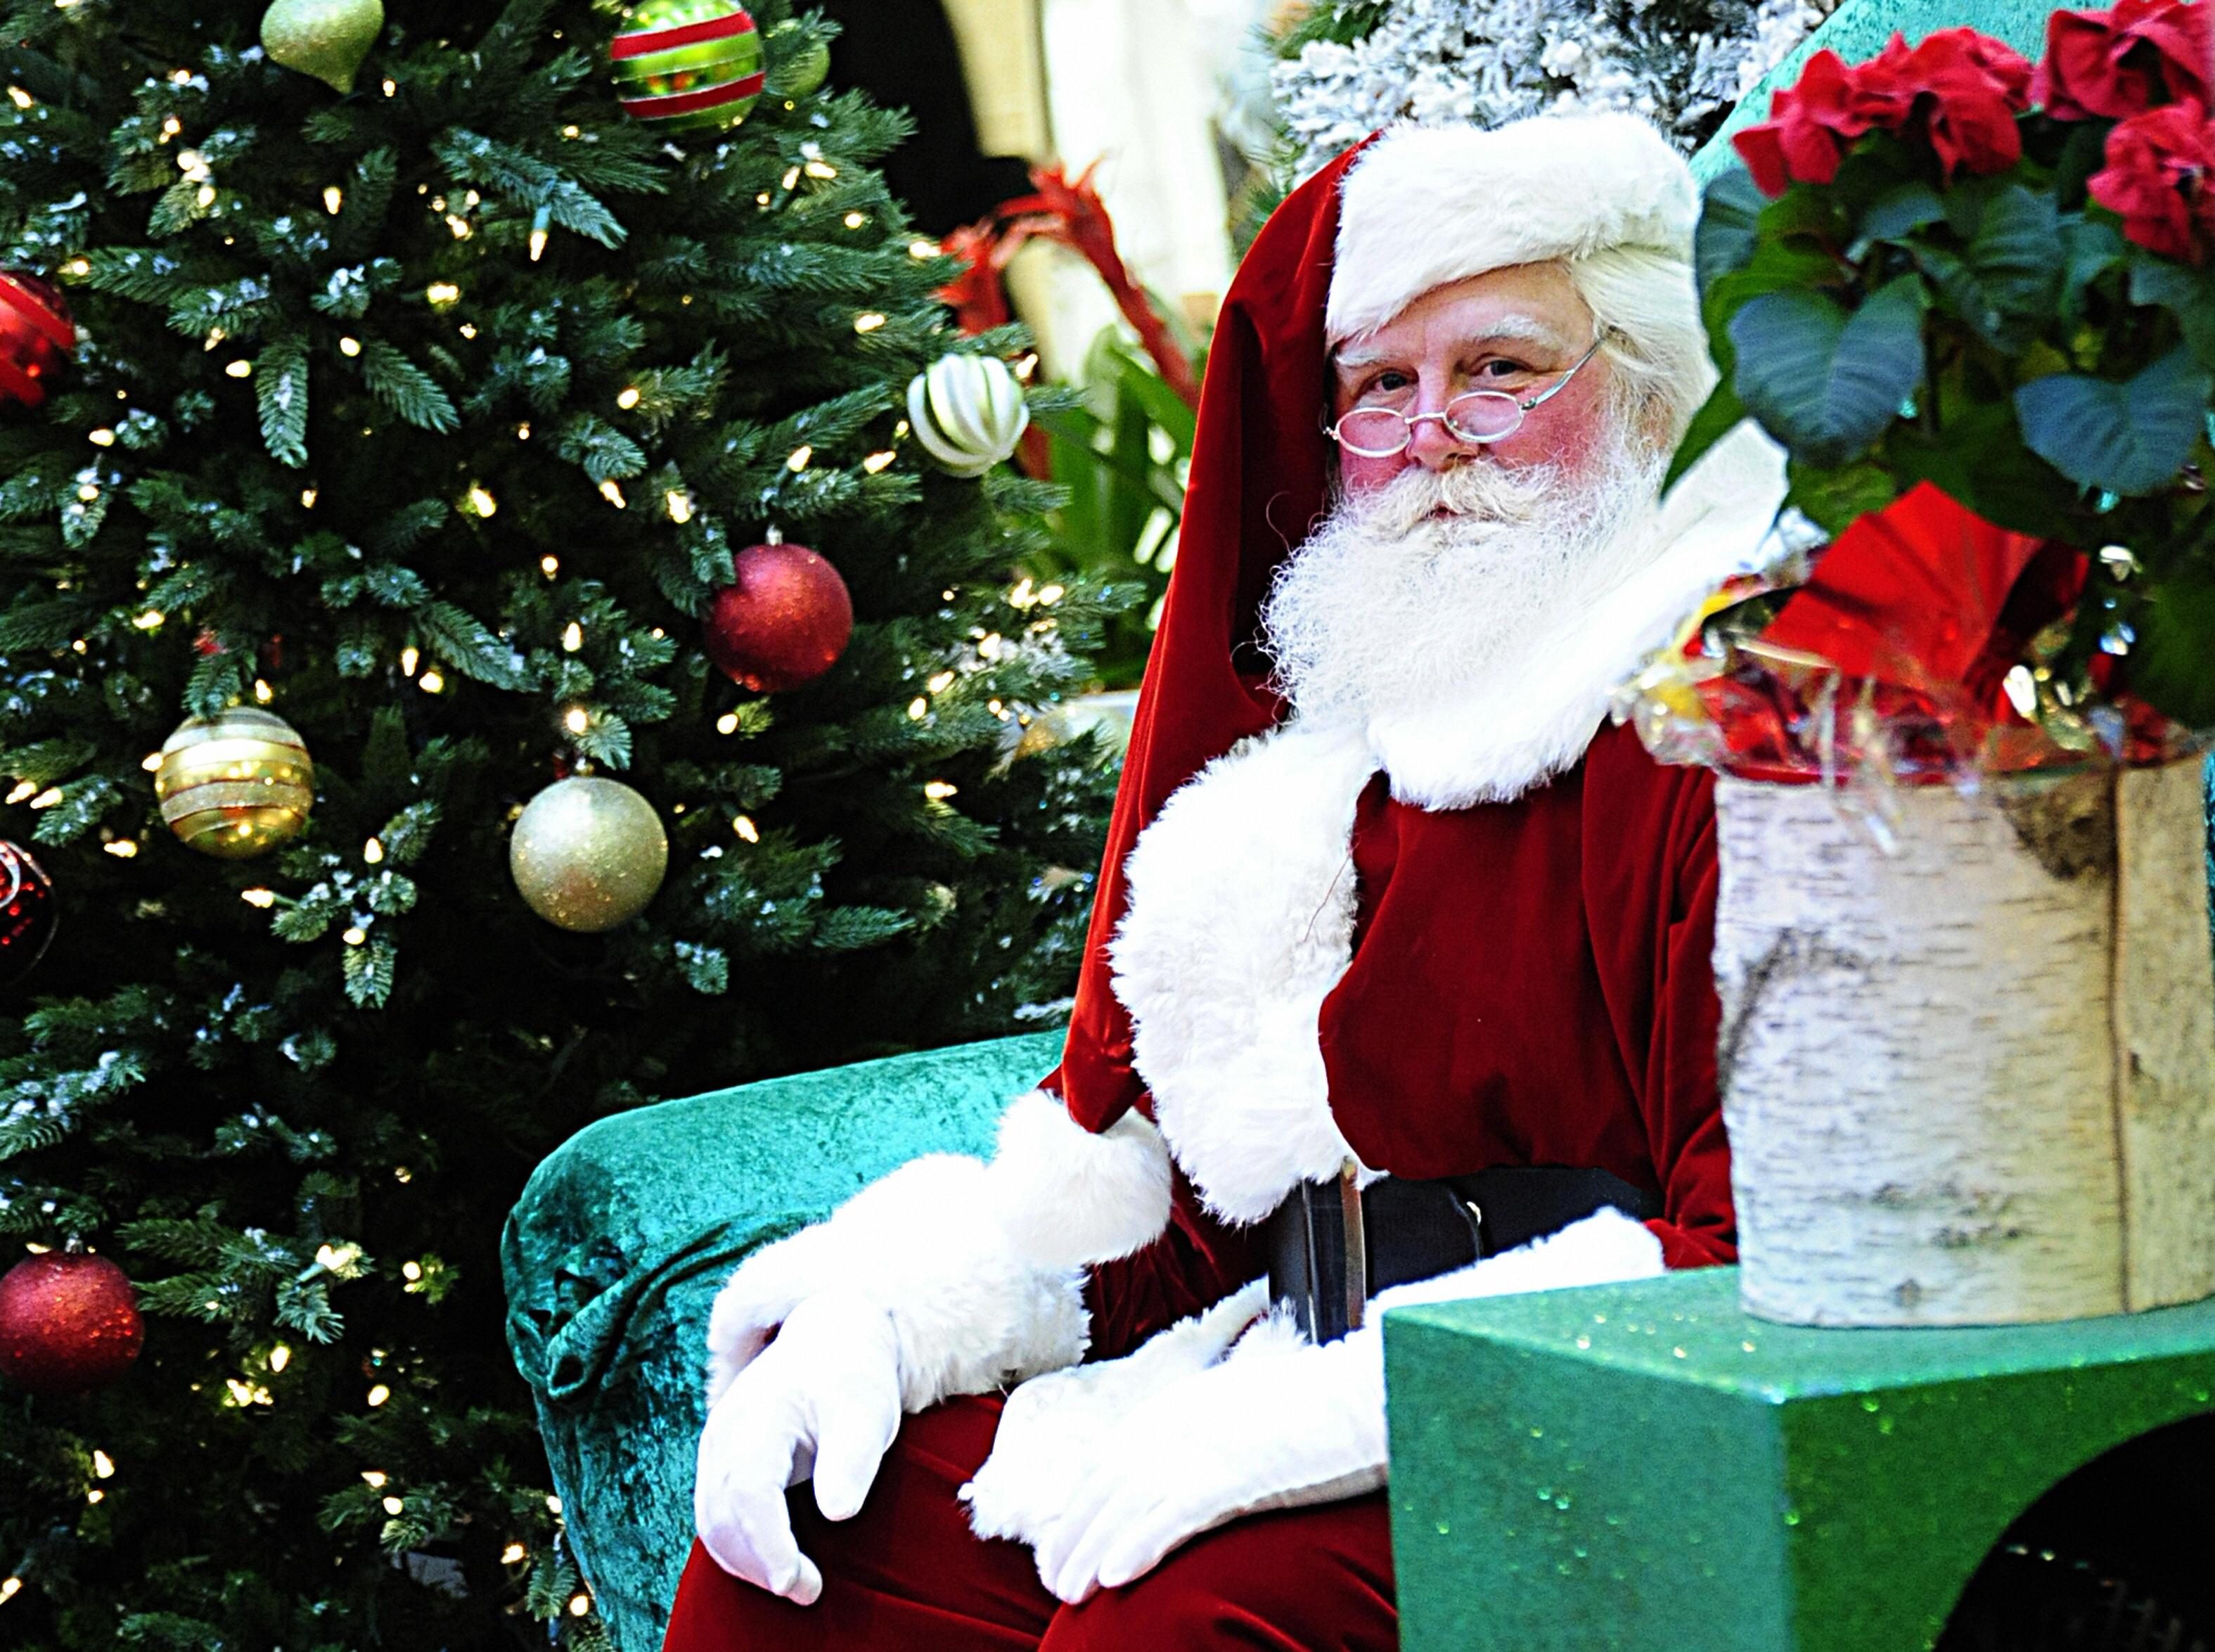 Santa Claus waits to greet children at the Tysons Corner mall in Tysons Corner, Virginia, on Dec. 20, 2008.